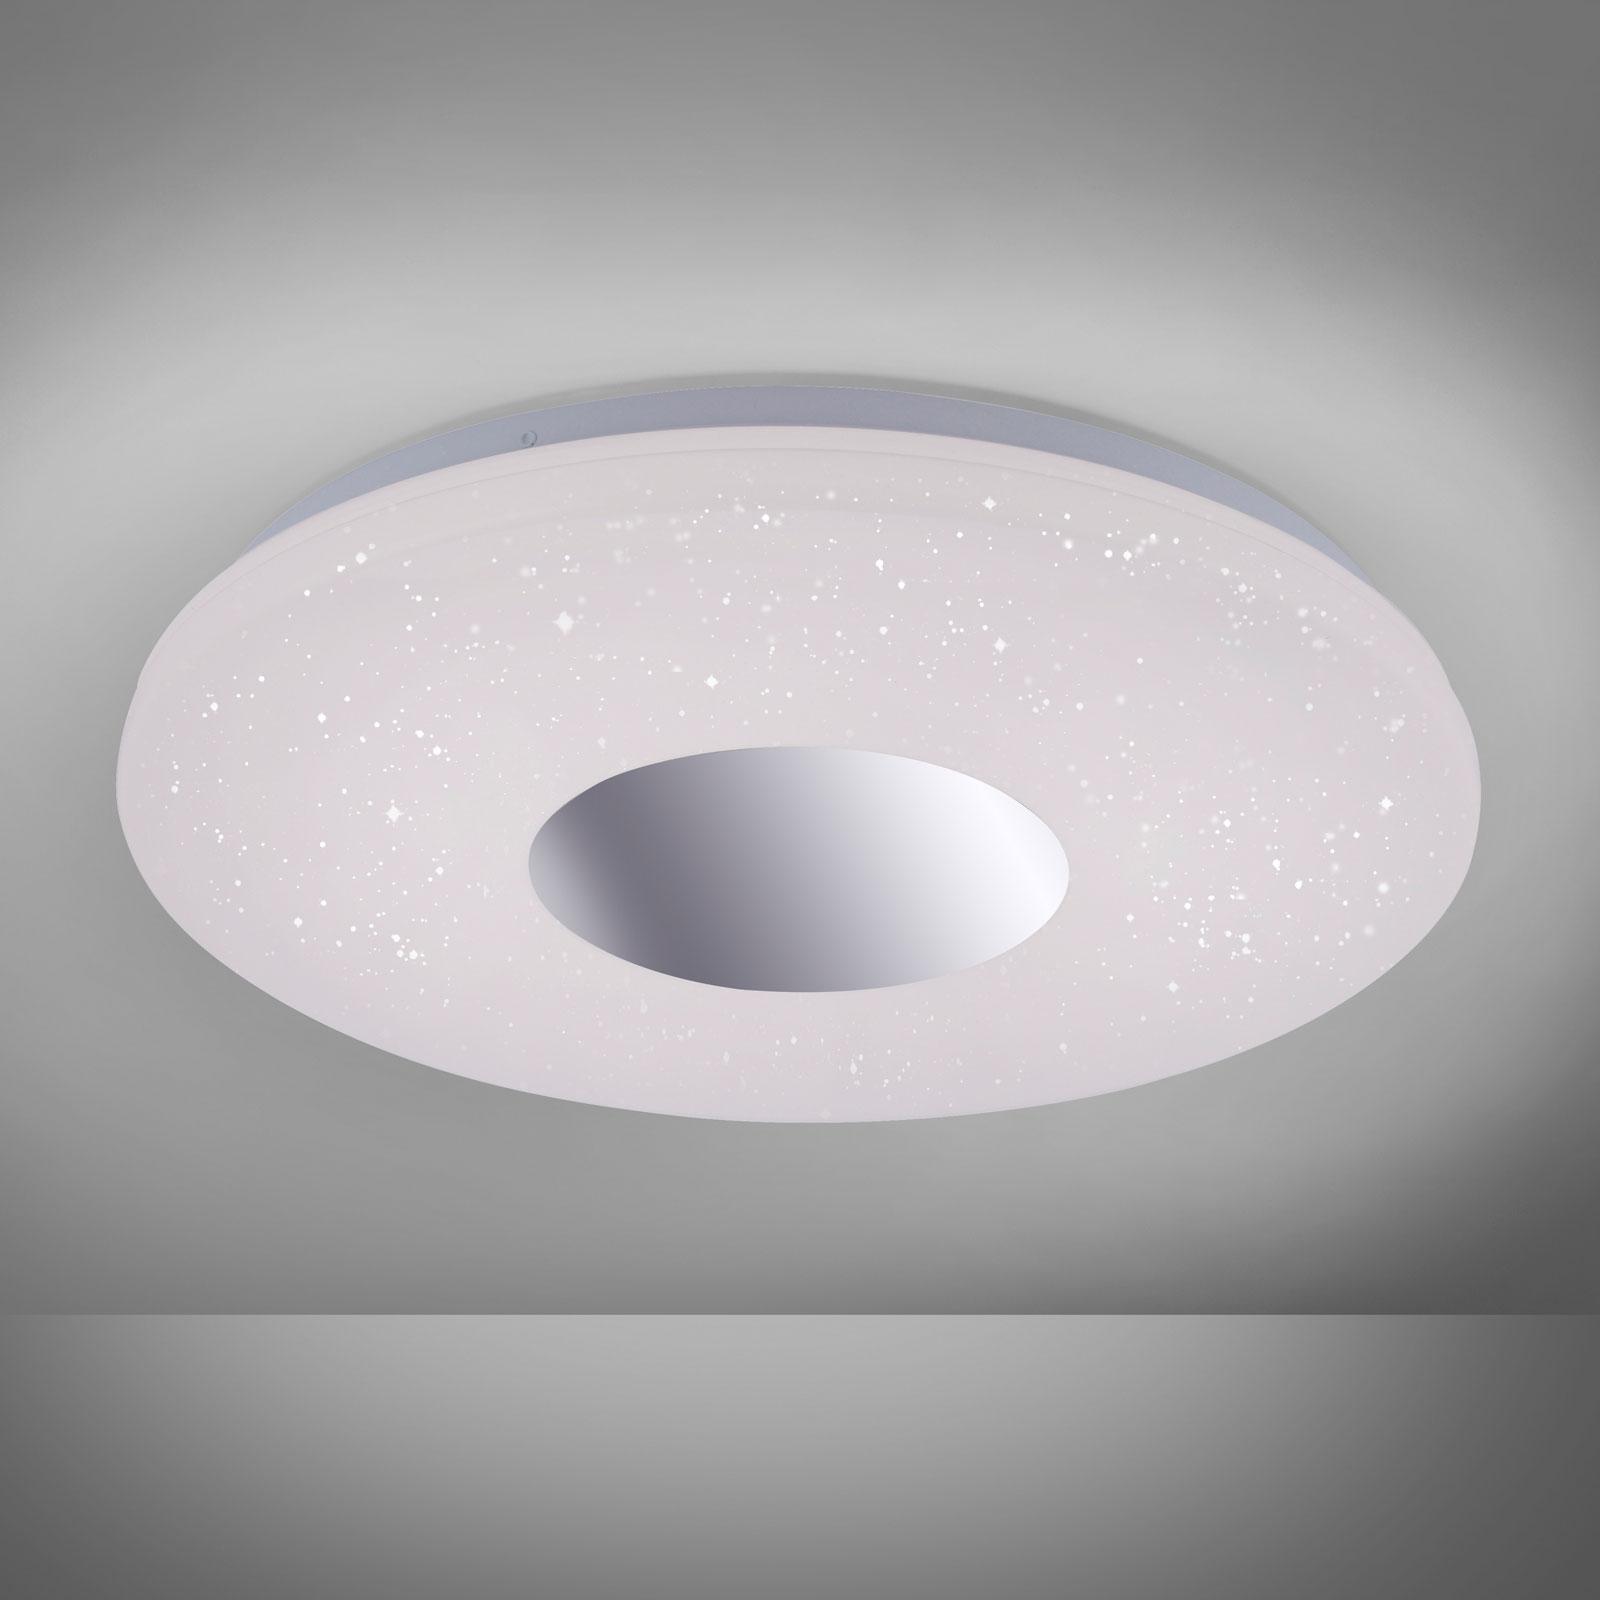 LED-Deckenleuchte Lavinia mit Sensor 38,5cm